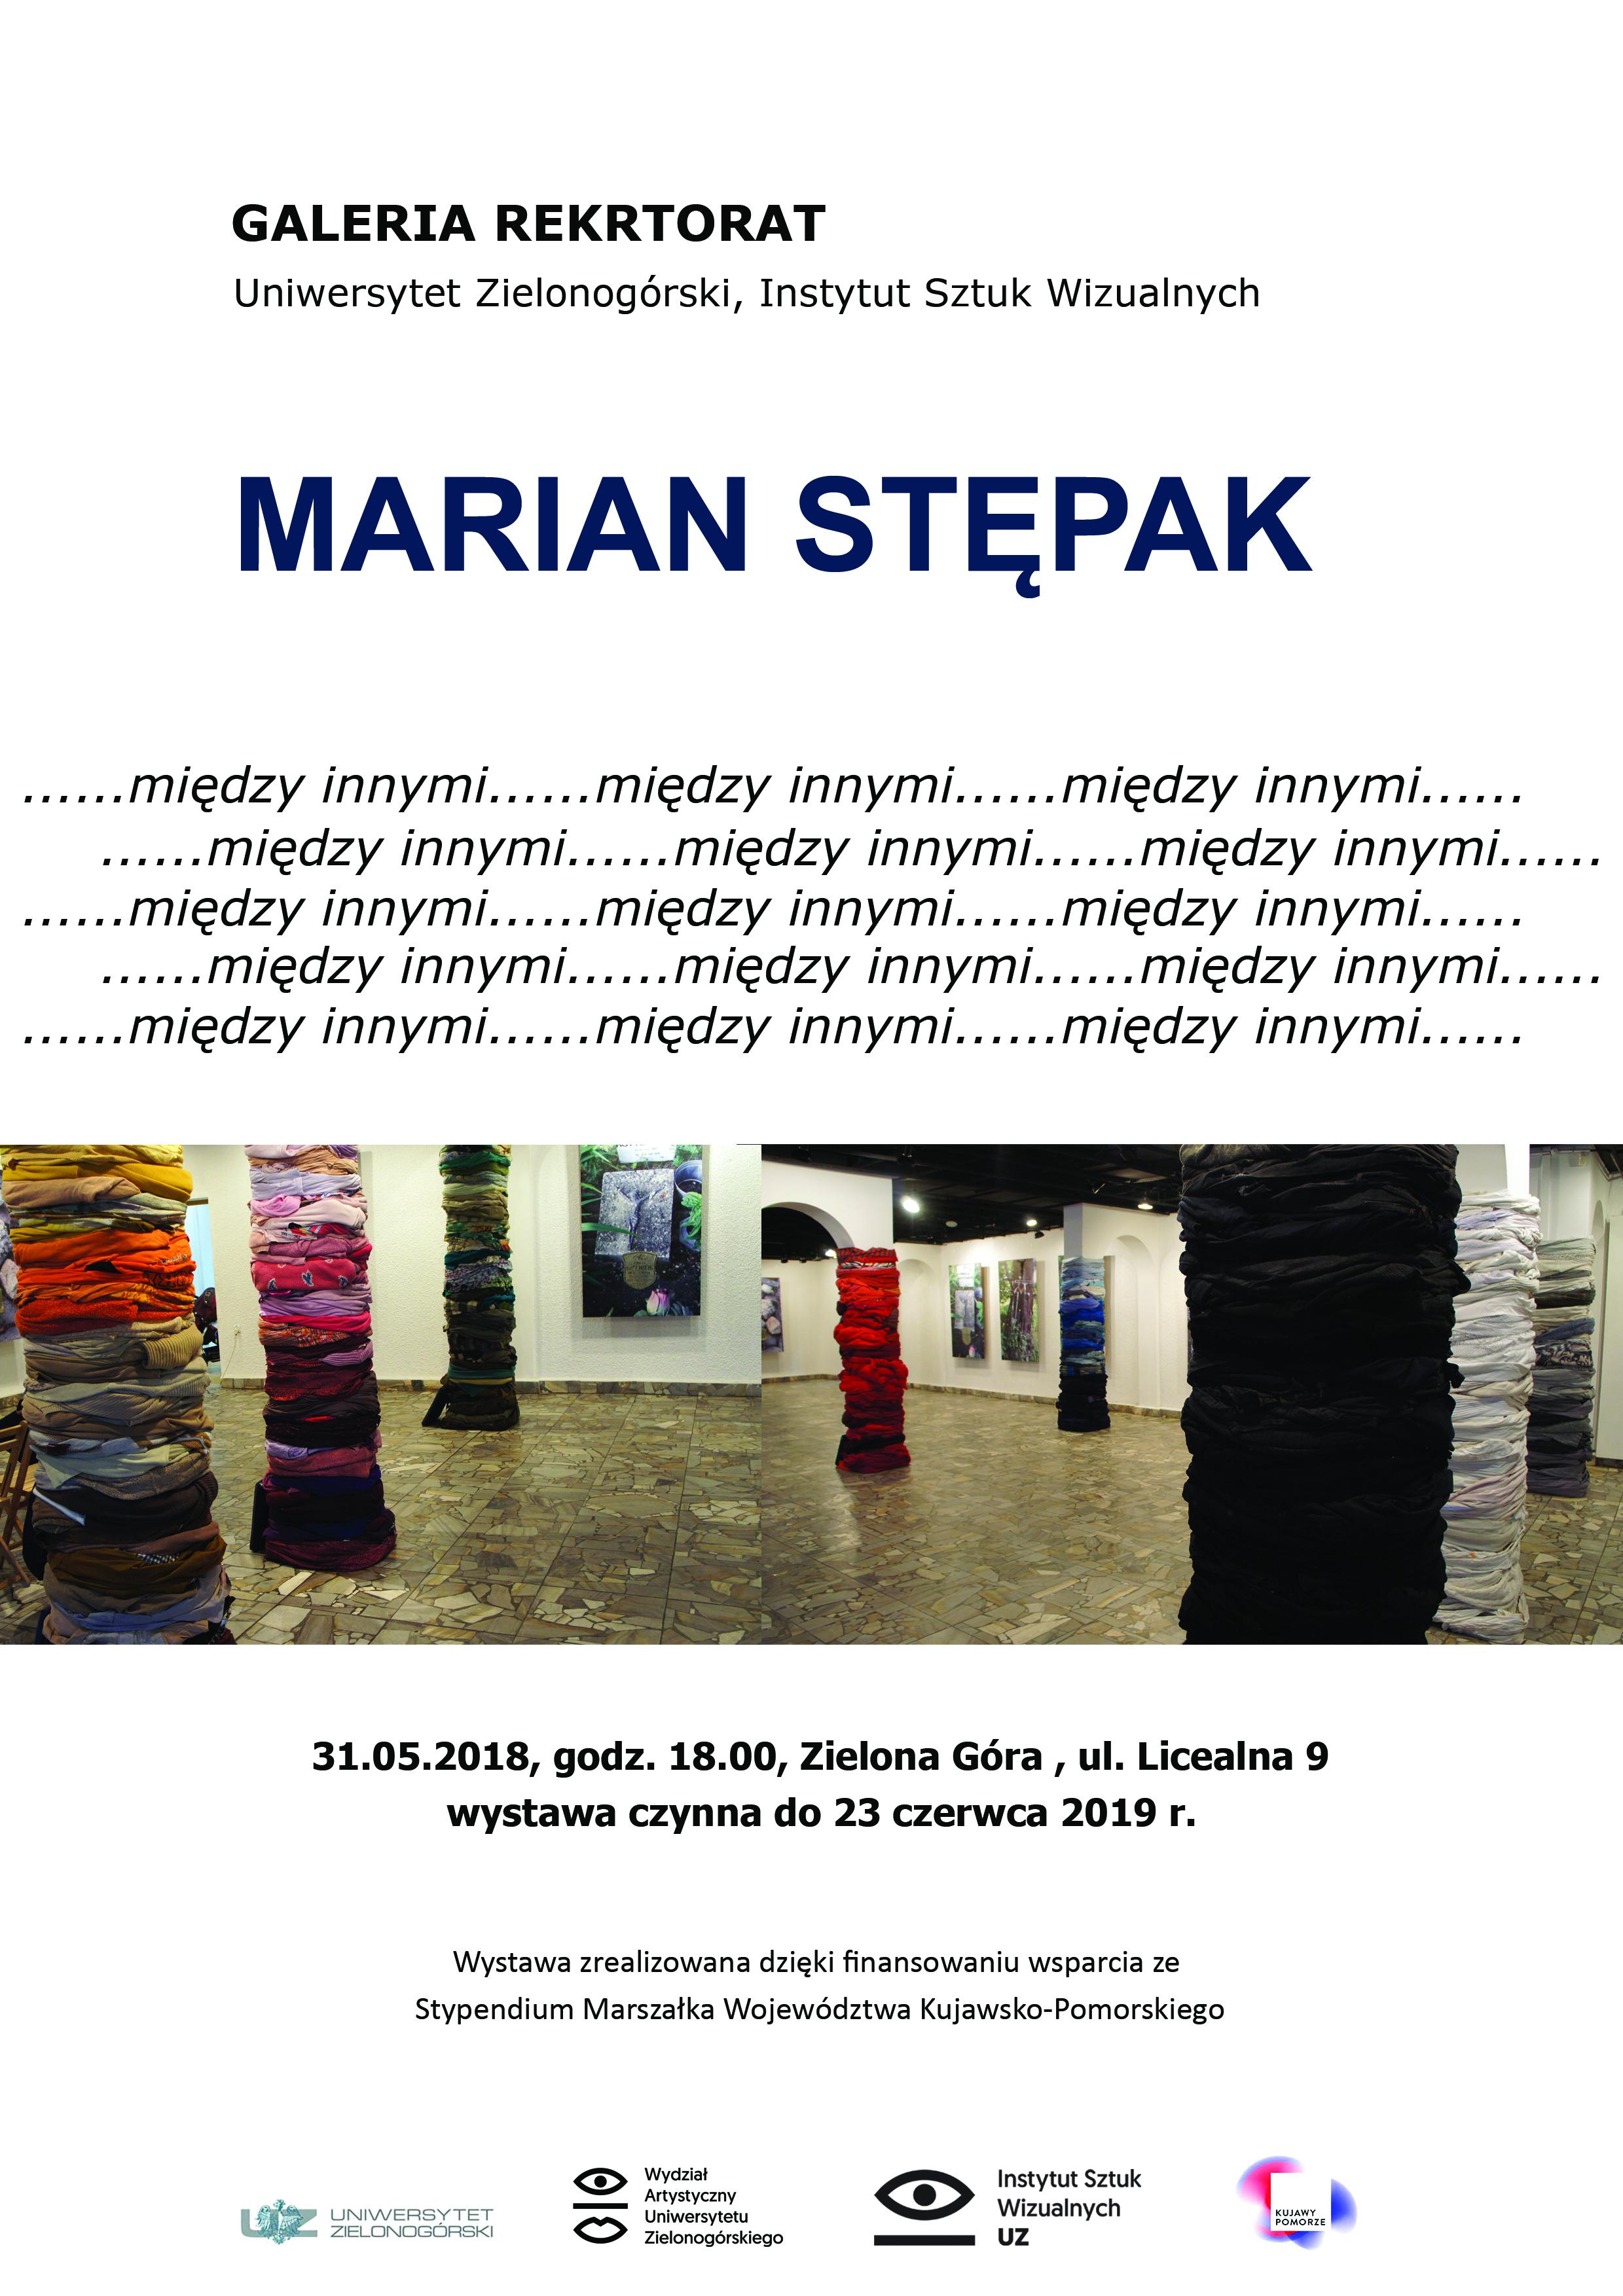 Marian Stępak, Galeria Rektorat, Zielona Góra